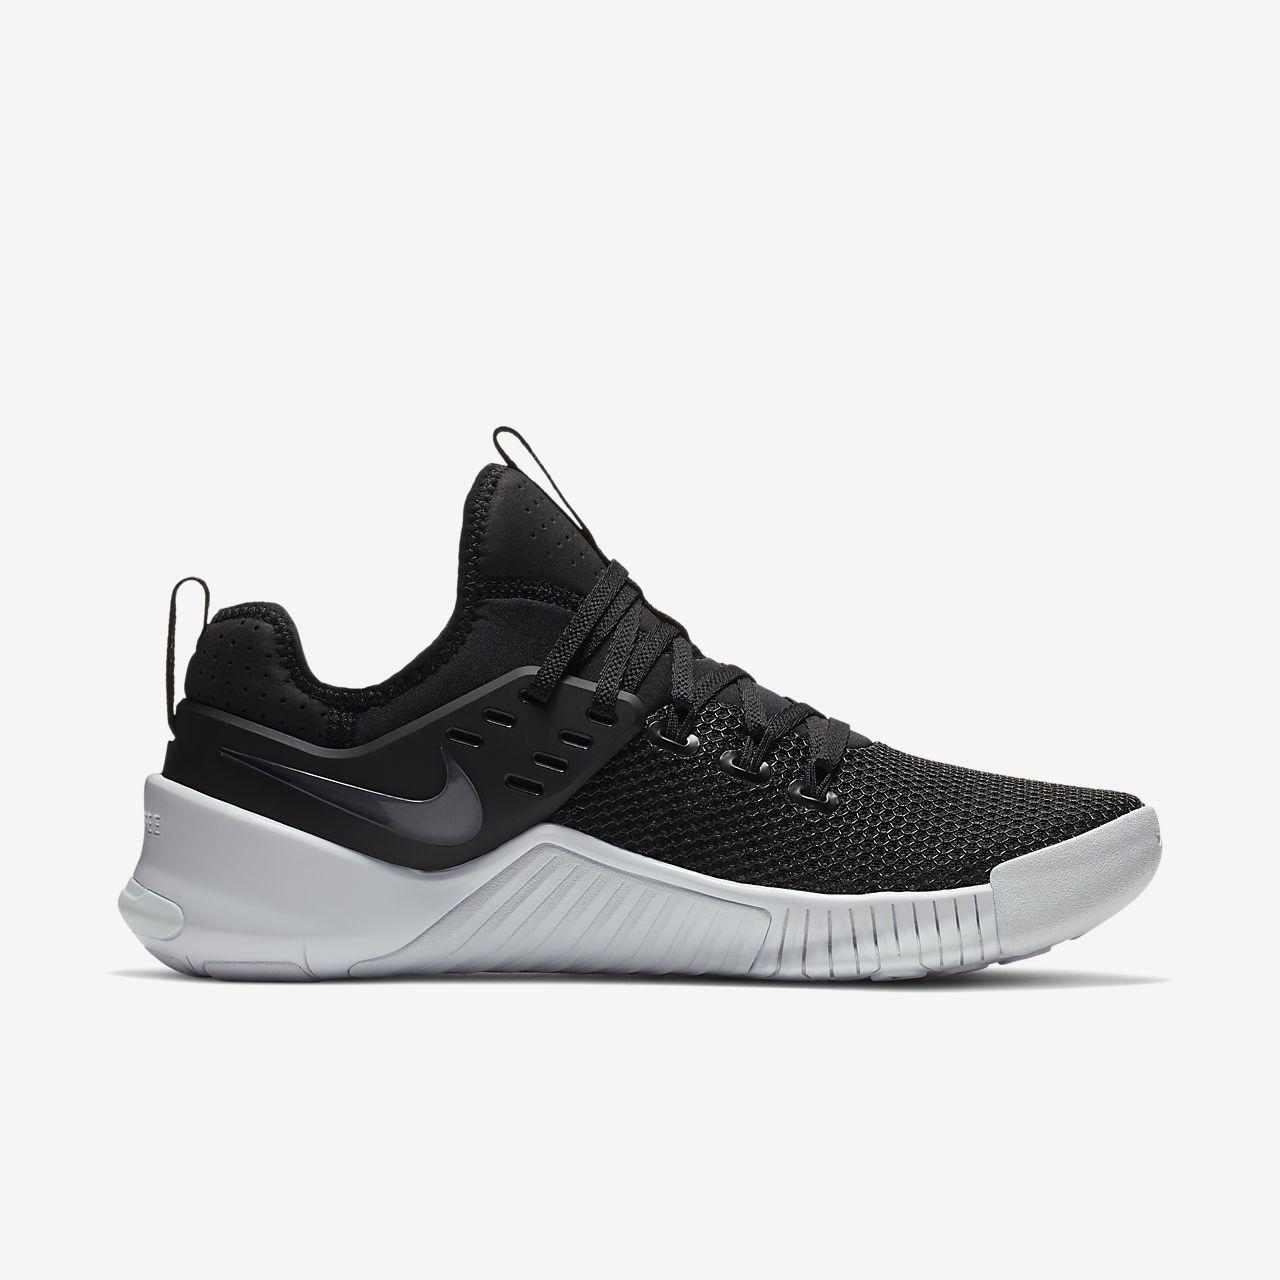 Nike Stability Training Shoes